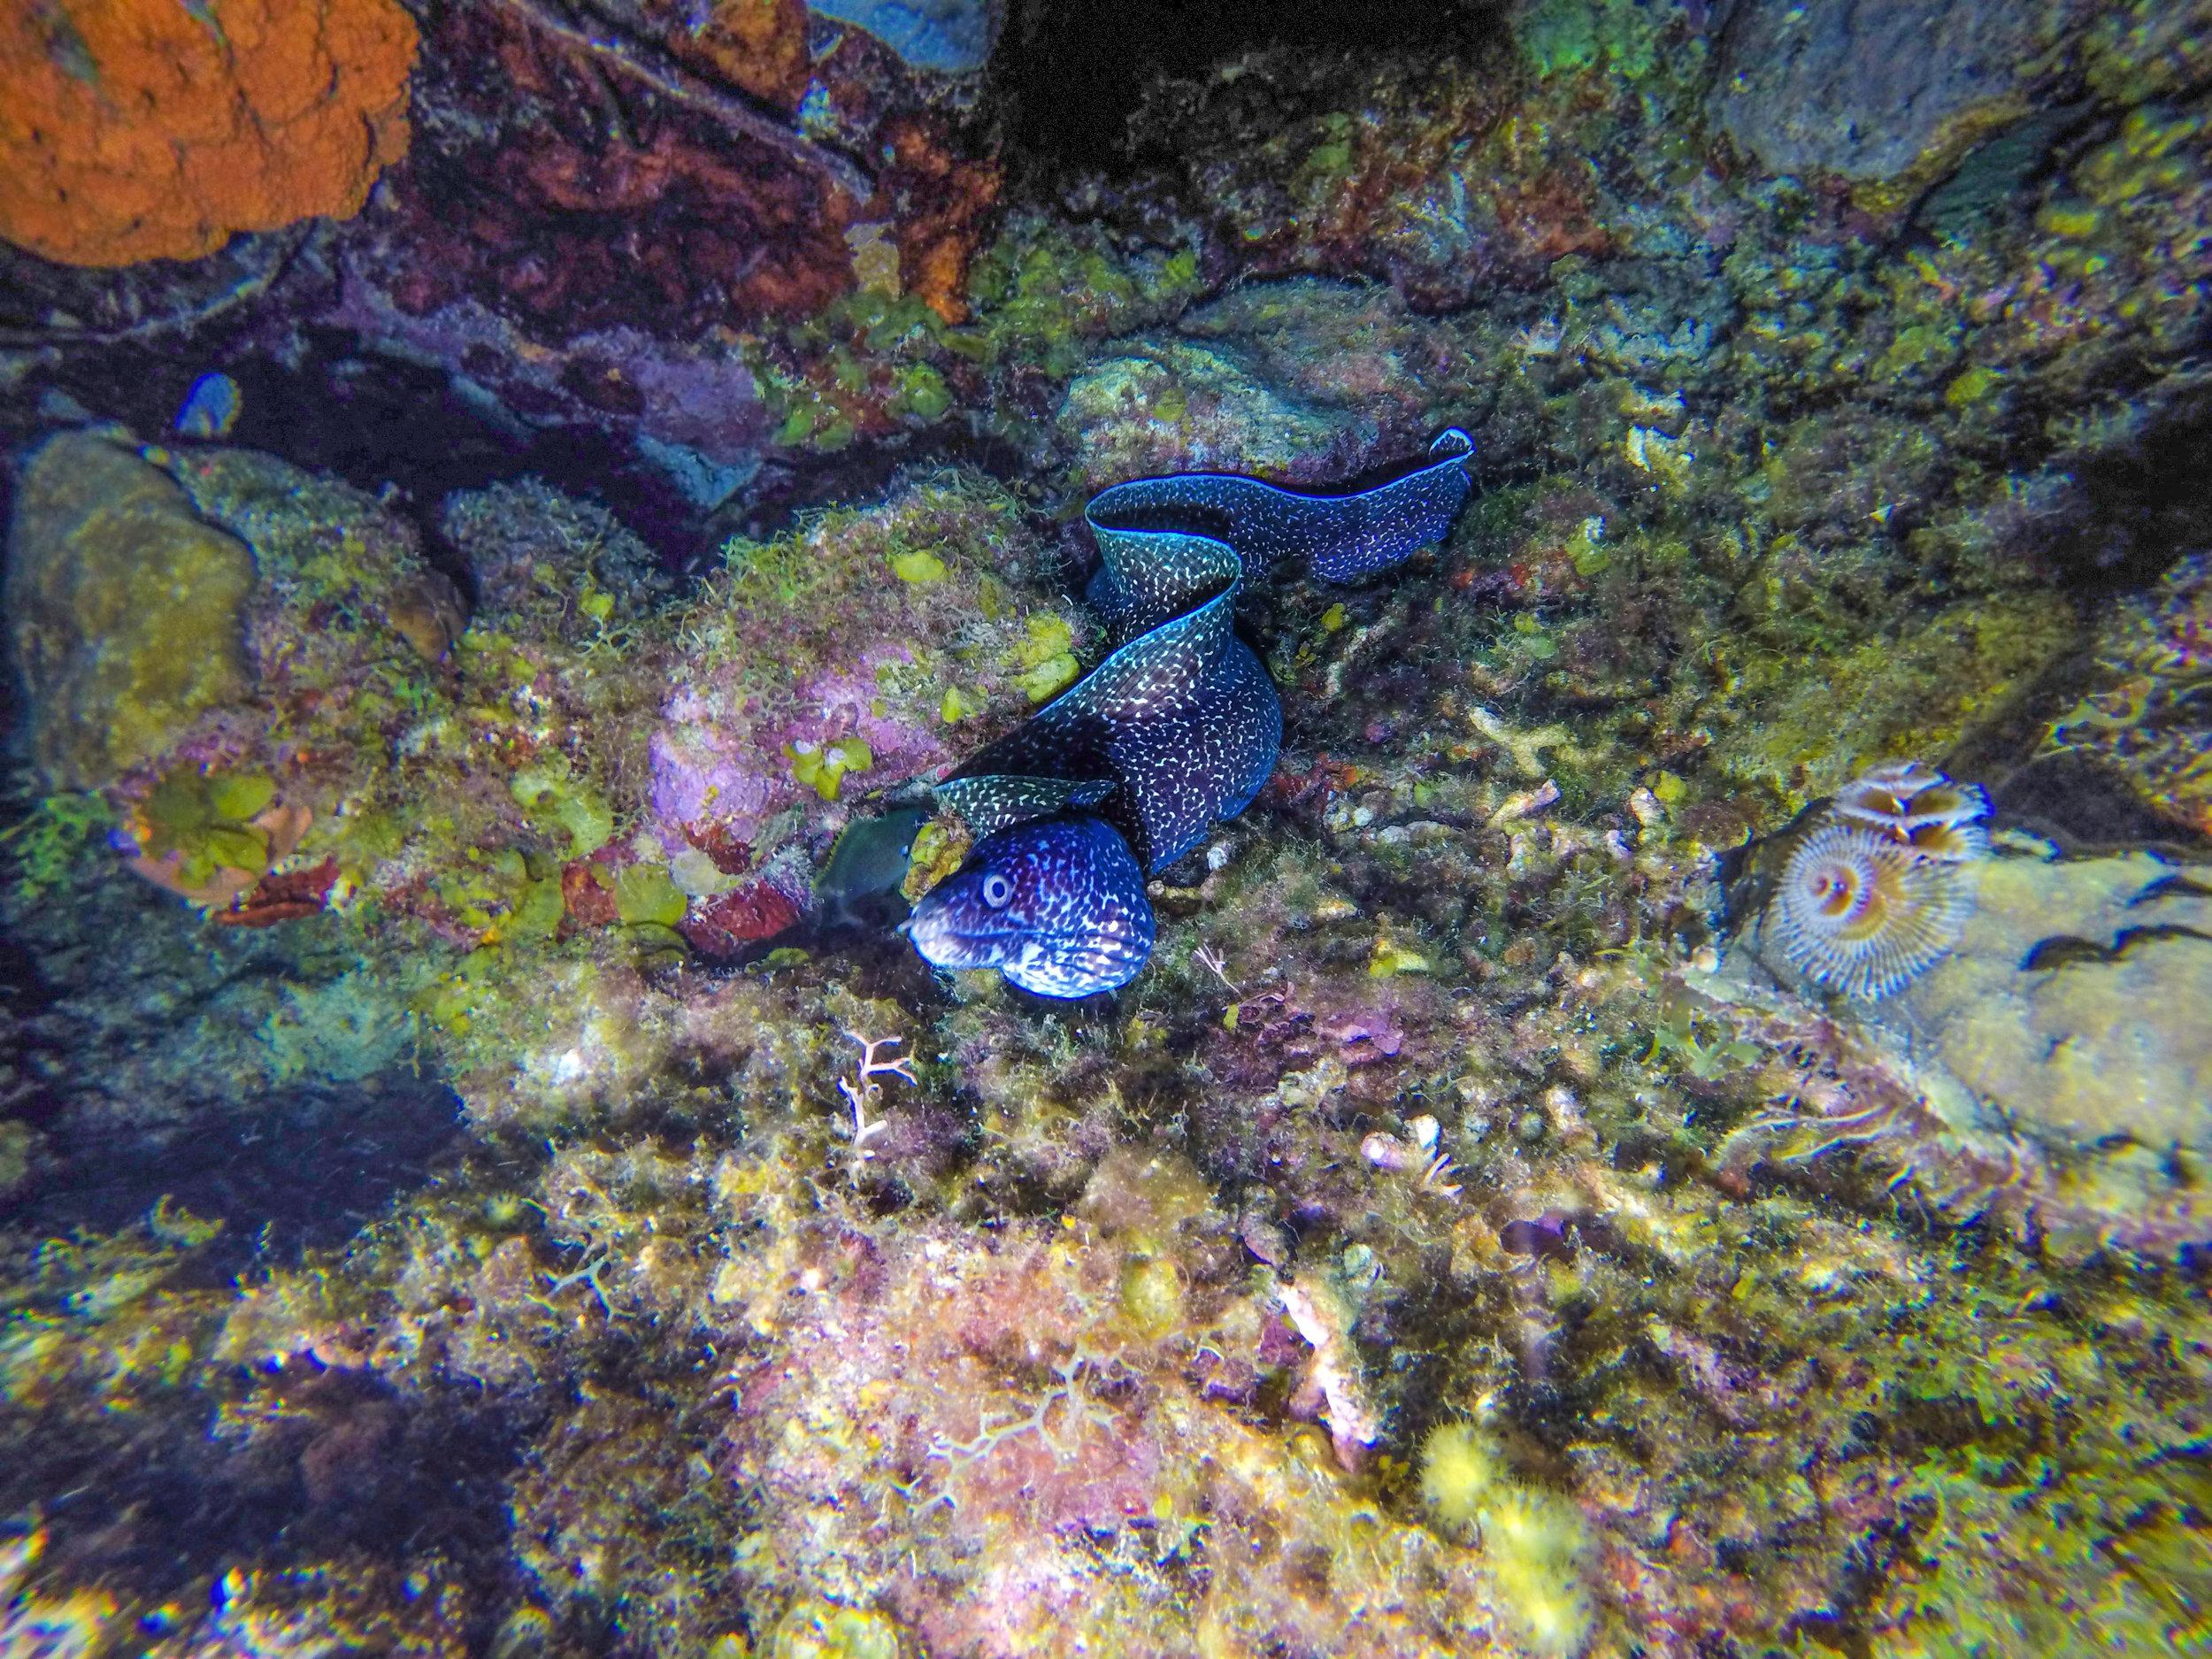 spotted eel in curacao.jpg